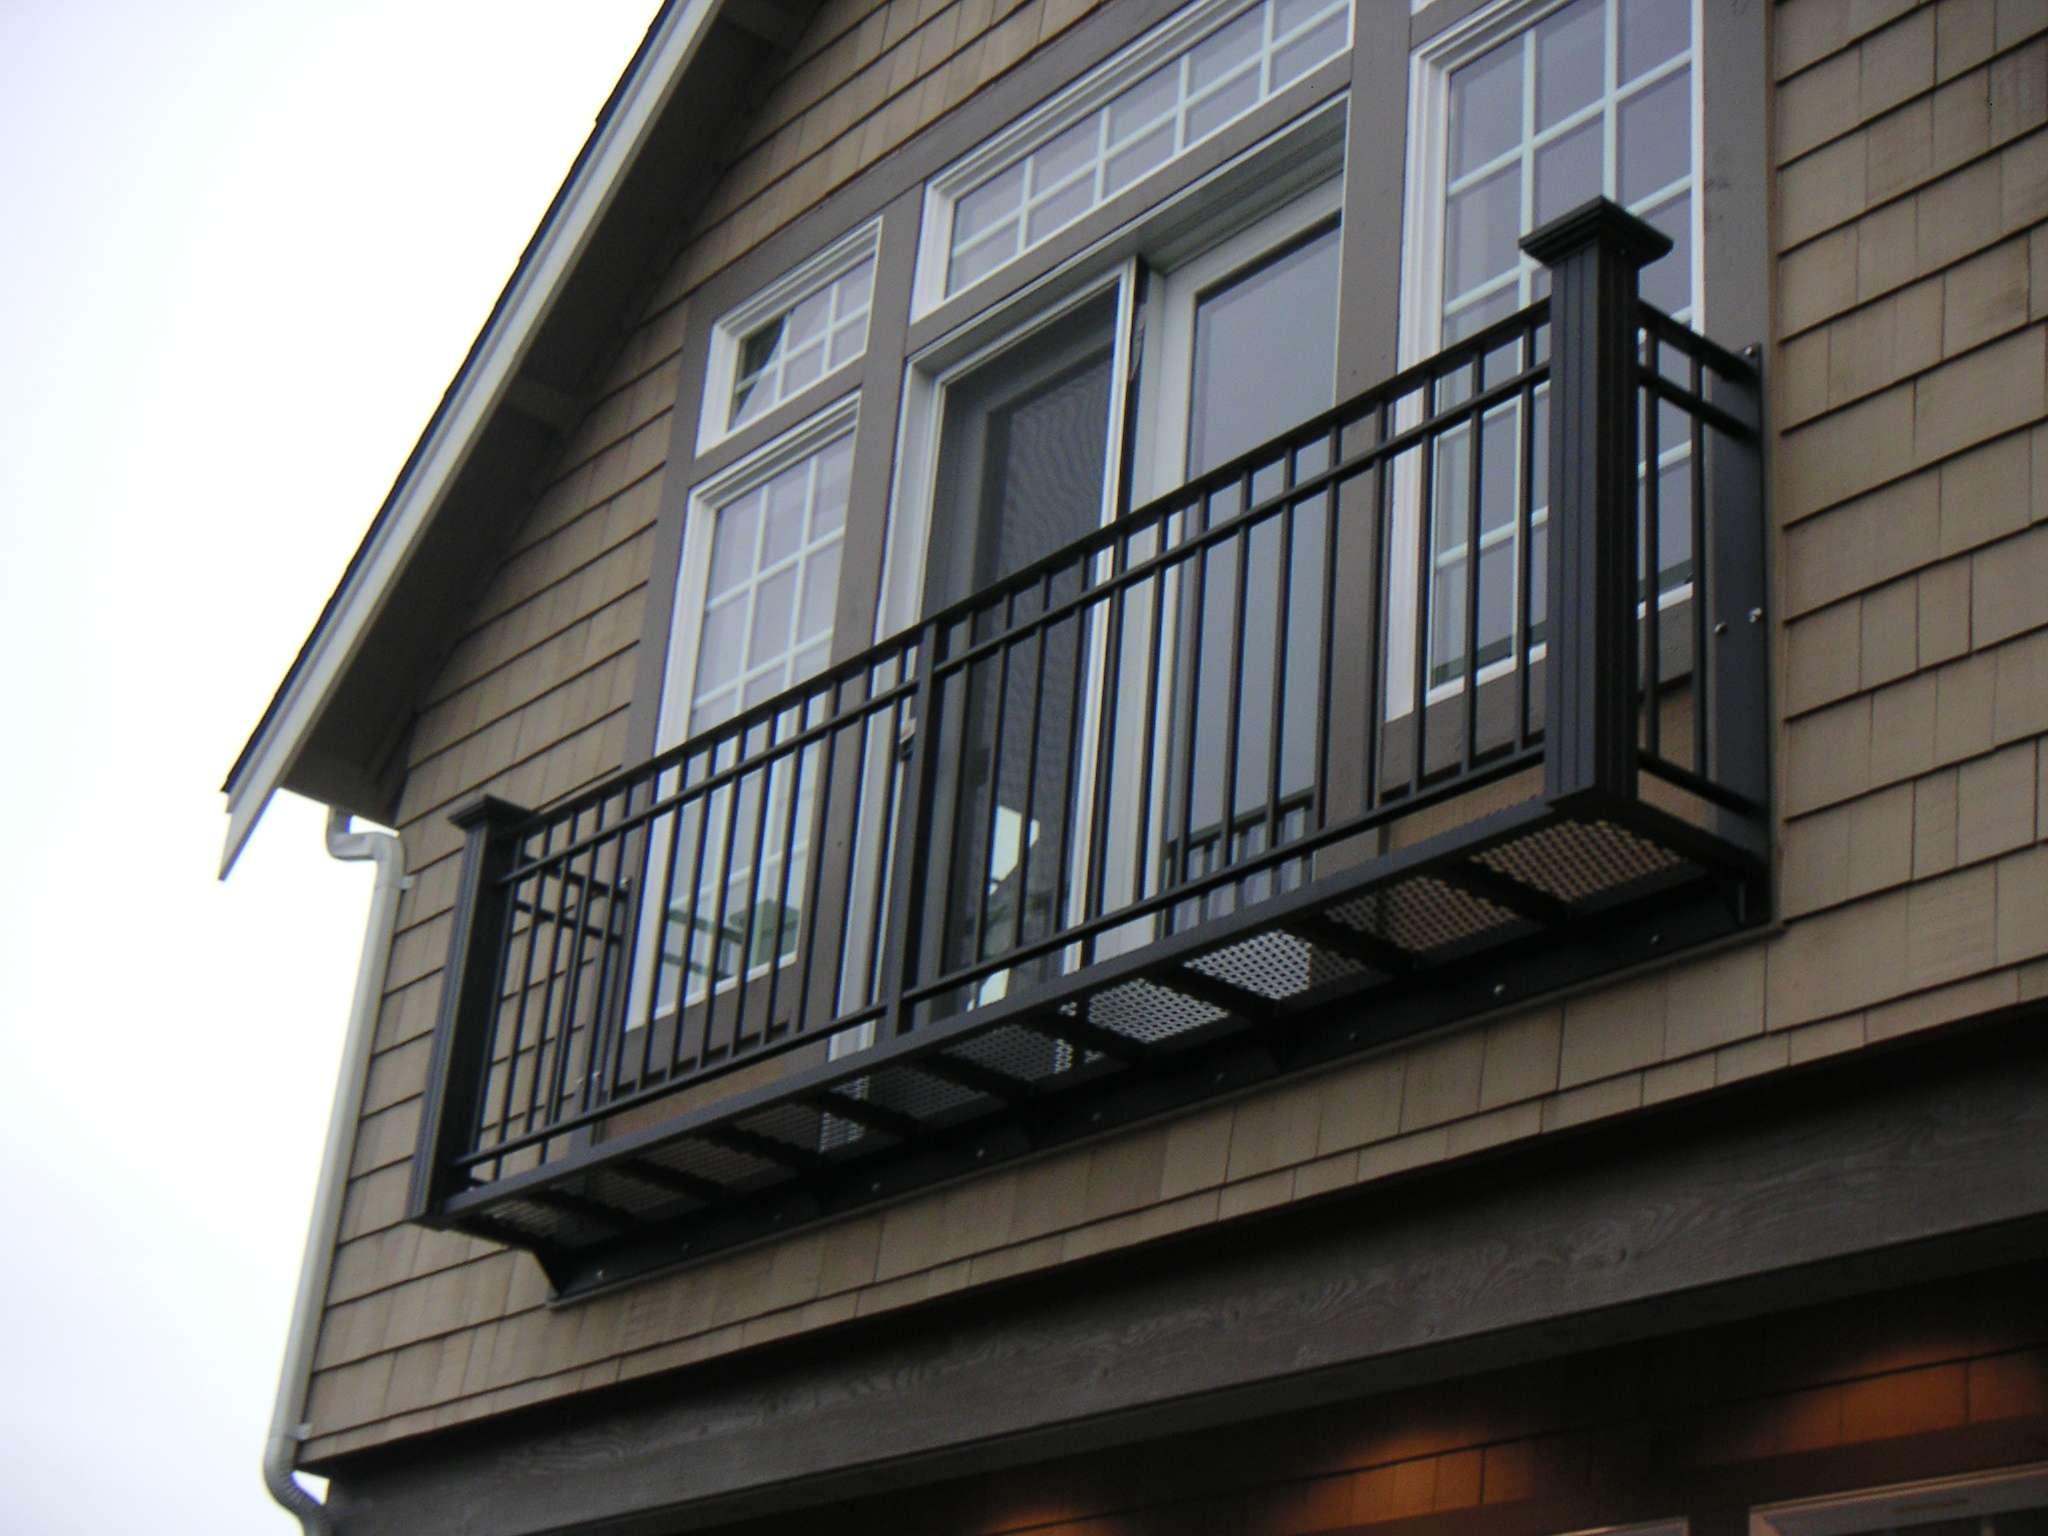 Rail Pro Bolt Aluminum Balconies Juilette Style Balcony